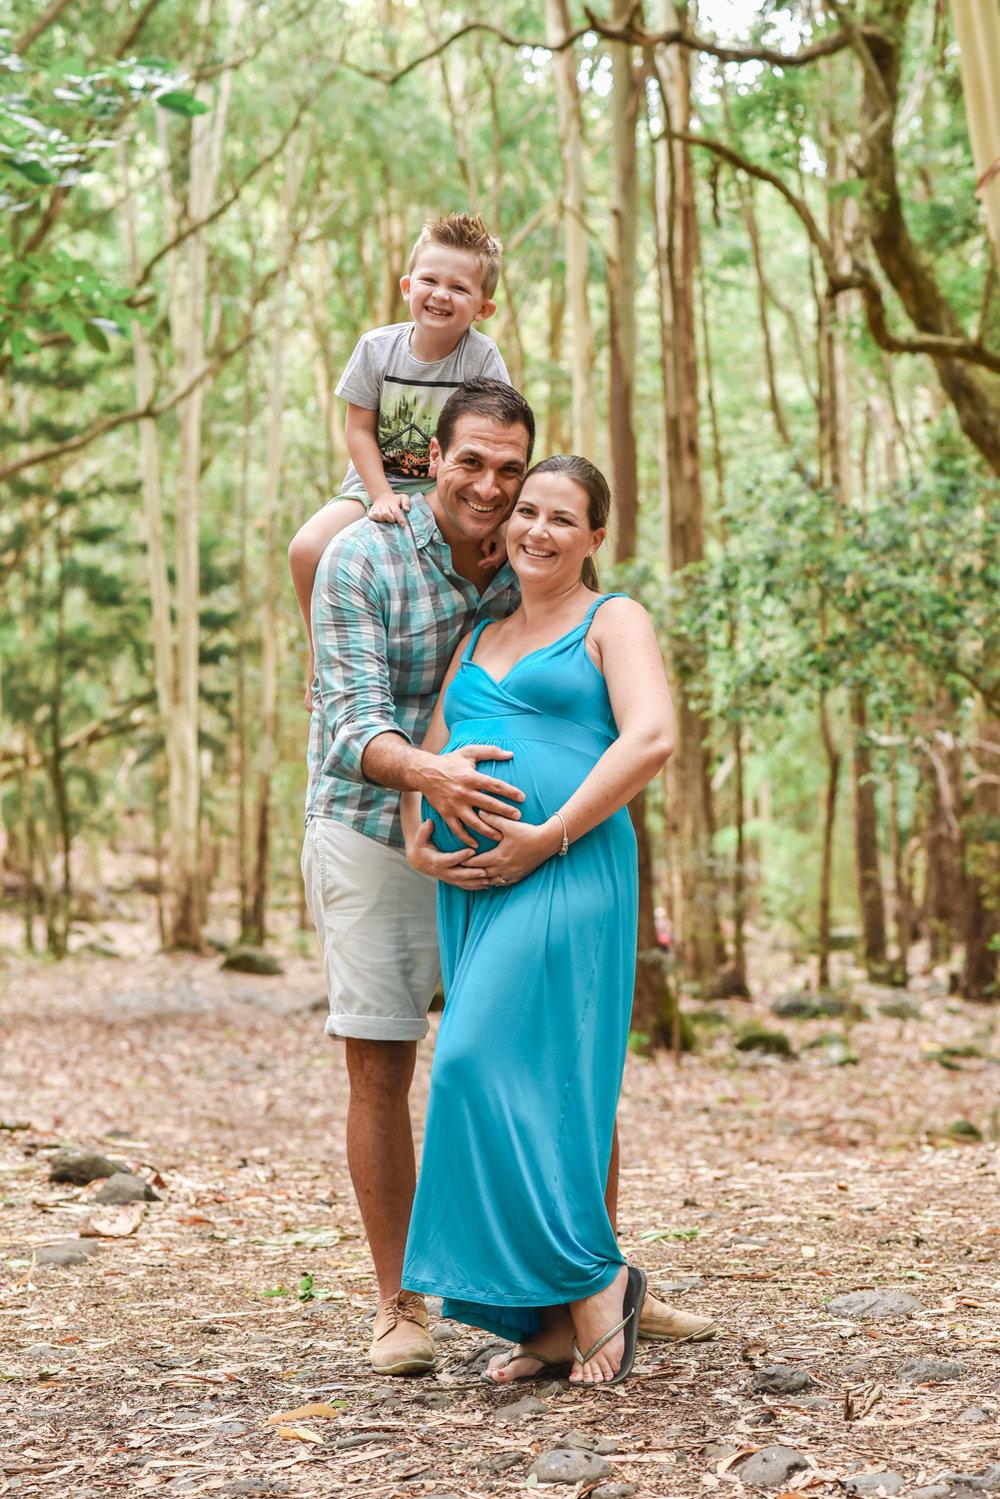 Mauritius-maternity-photography-6.jpg